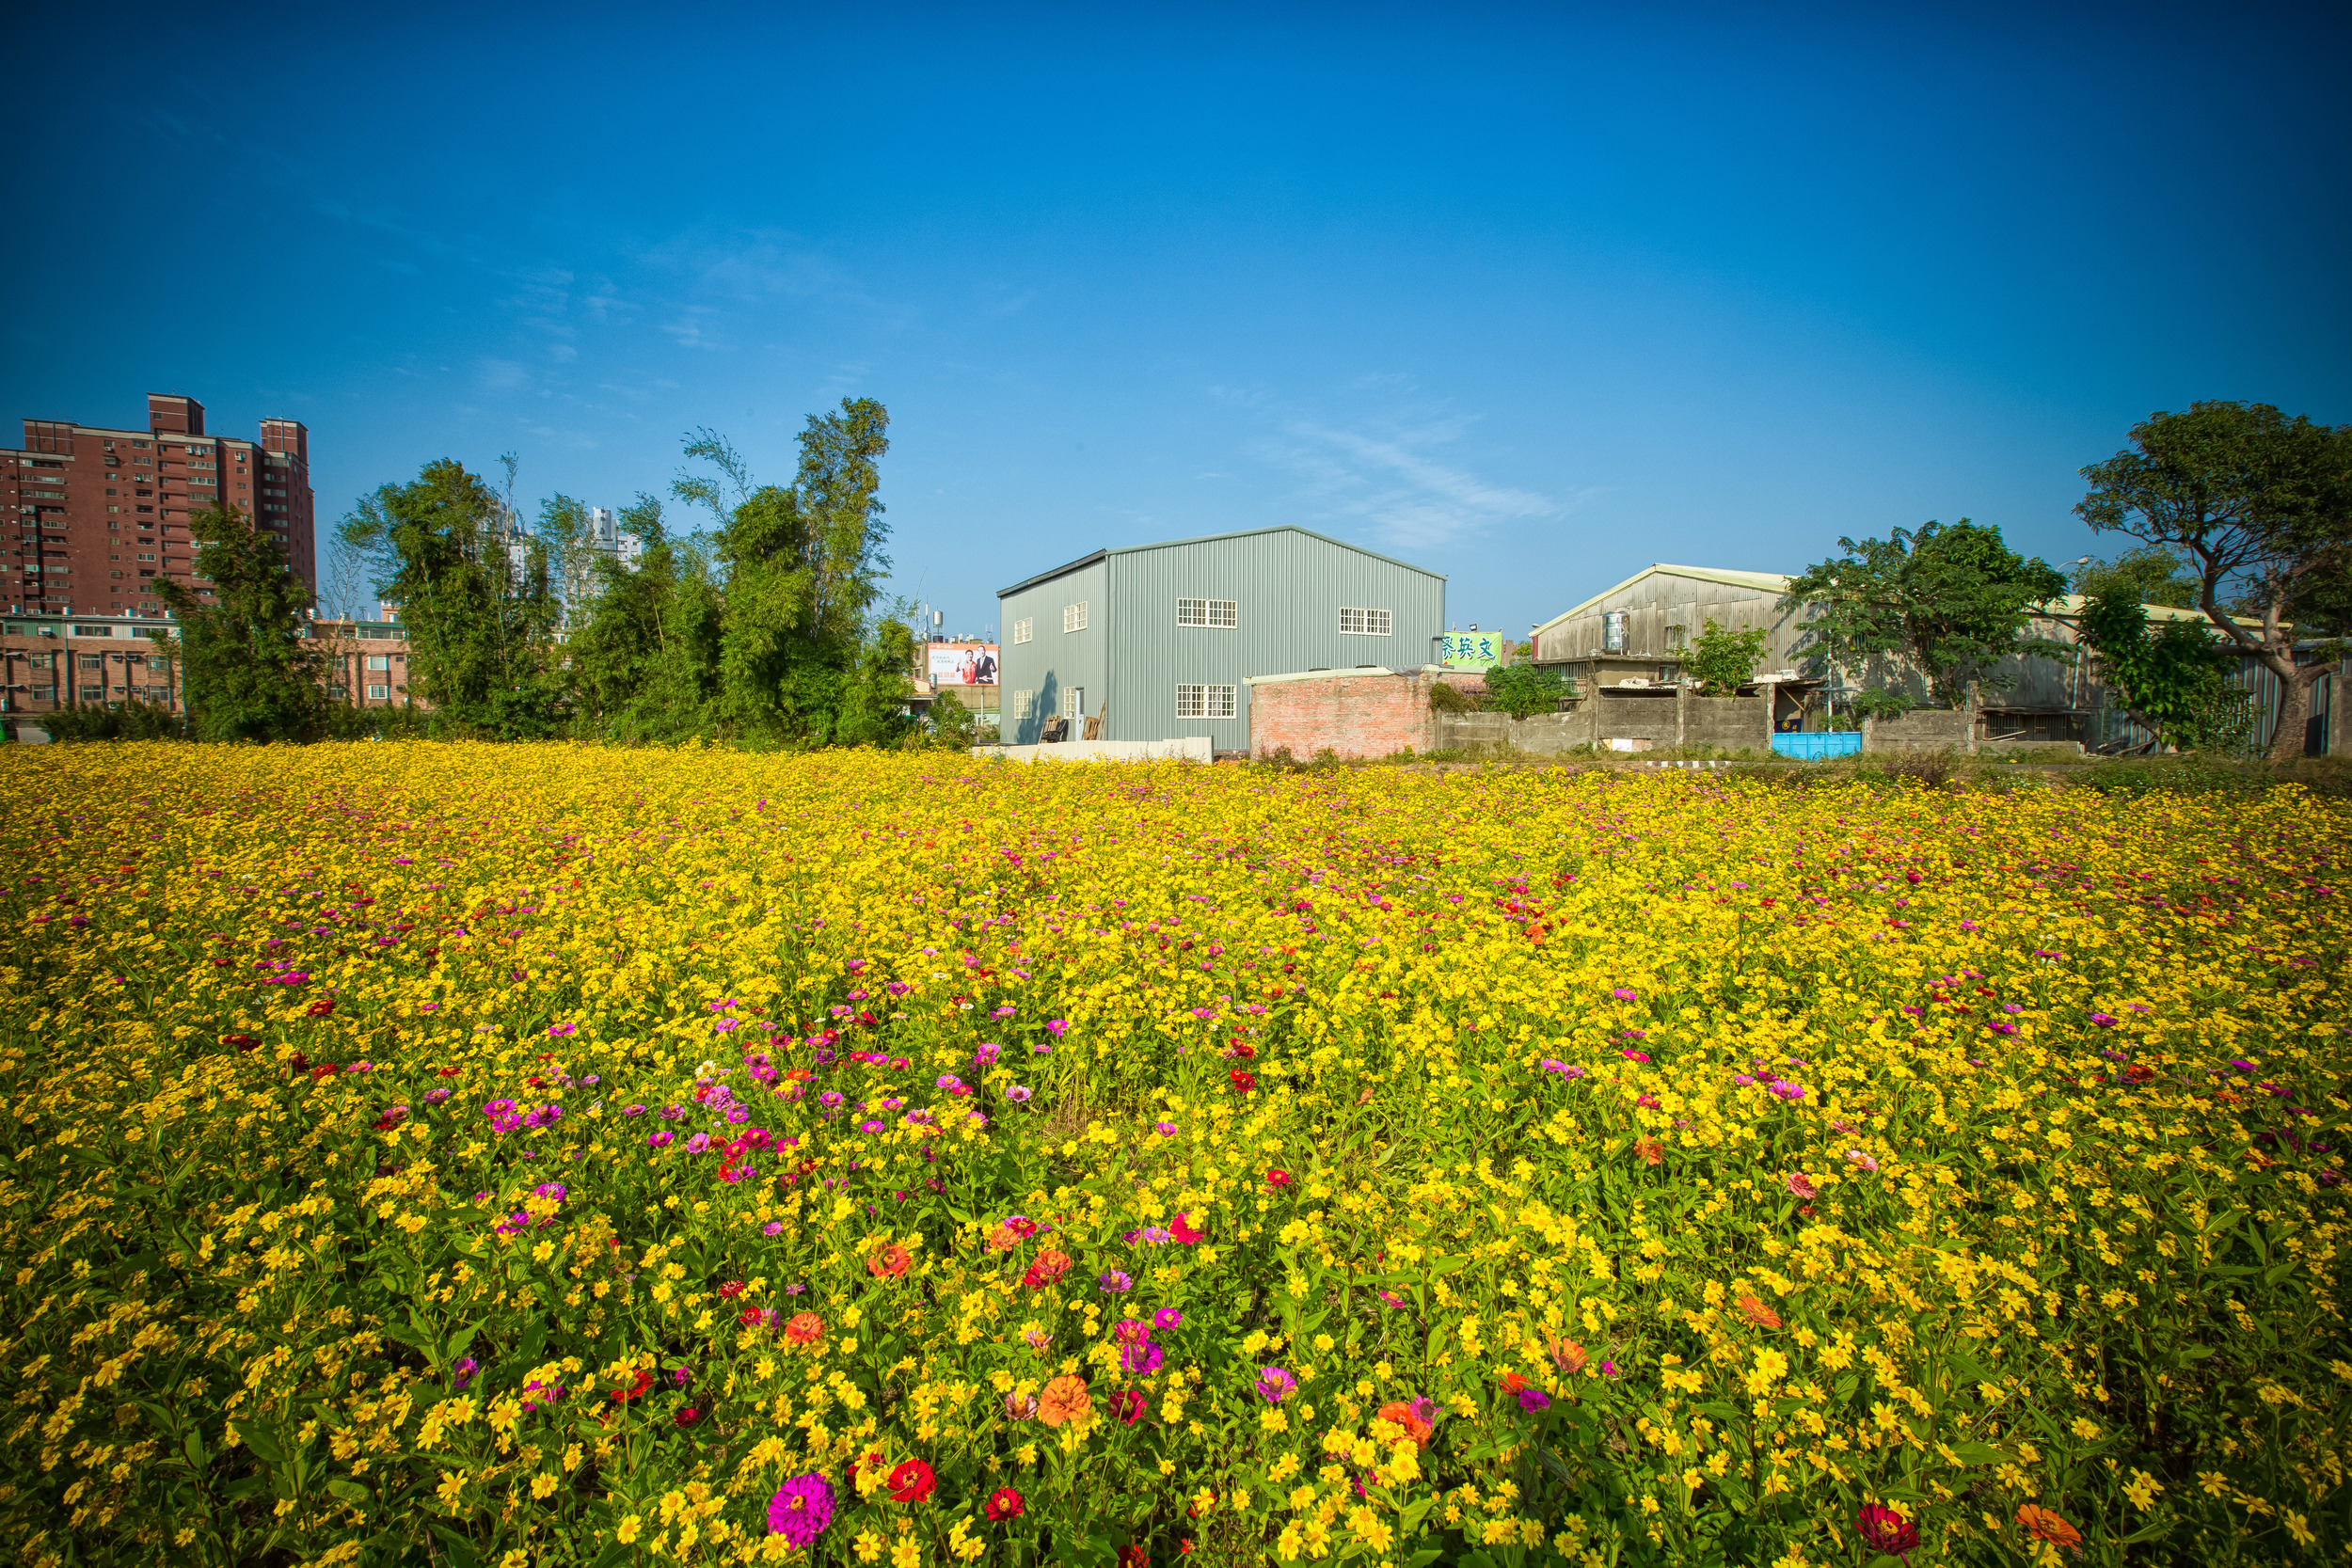 - A field of flowers near my home